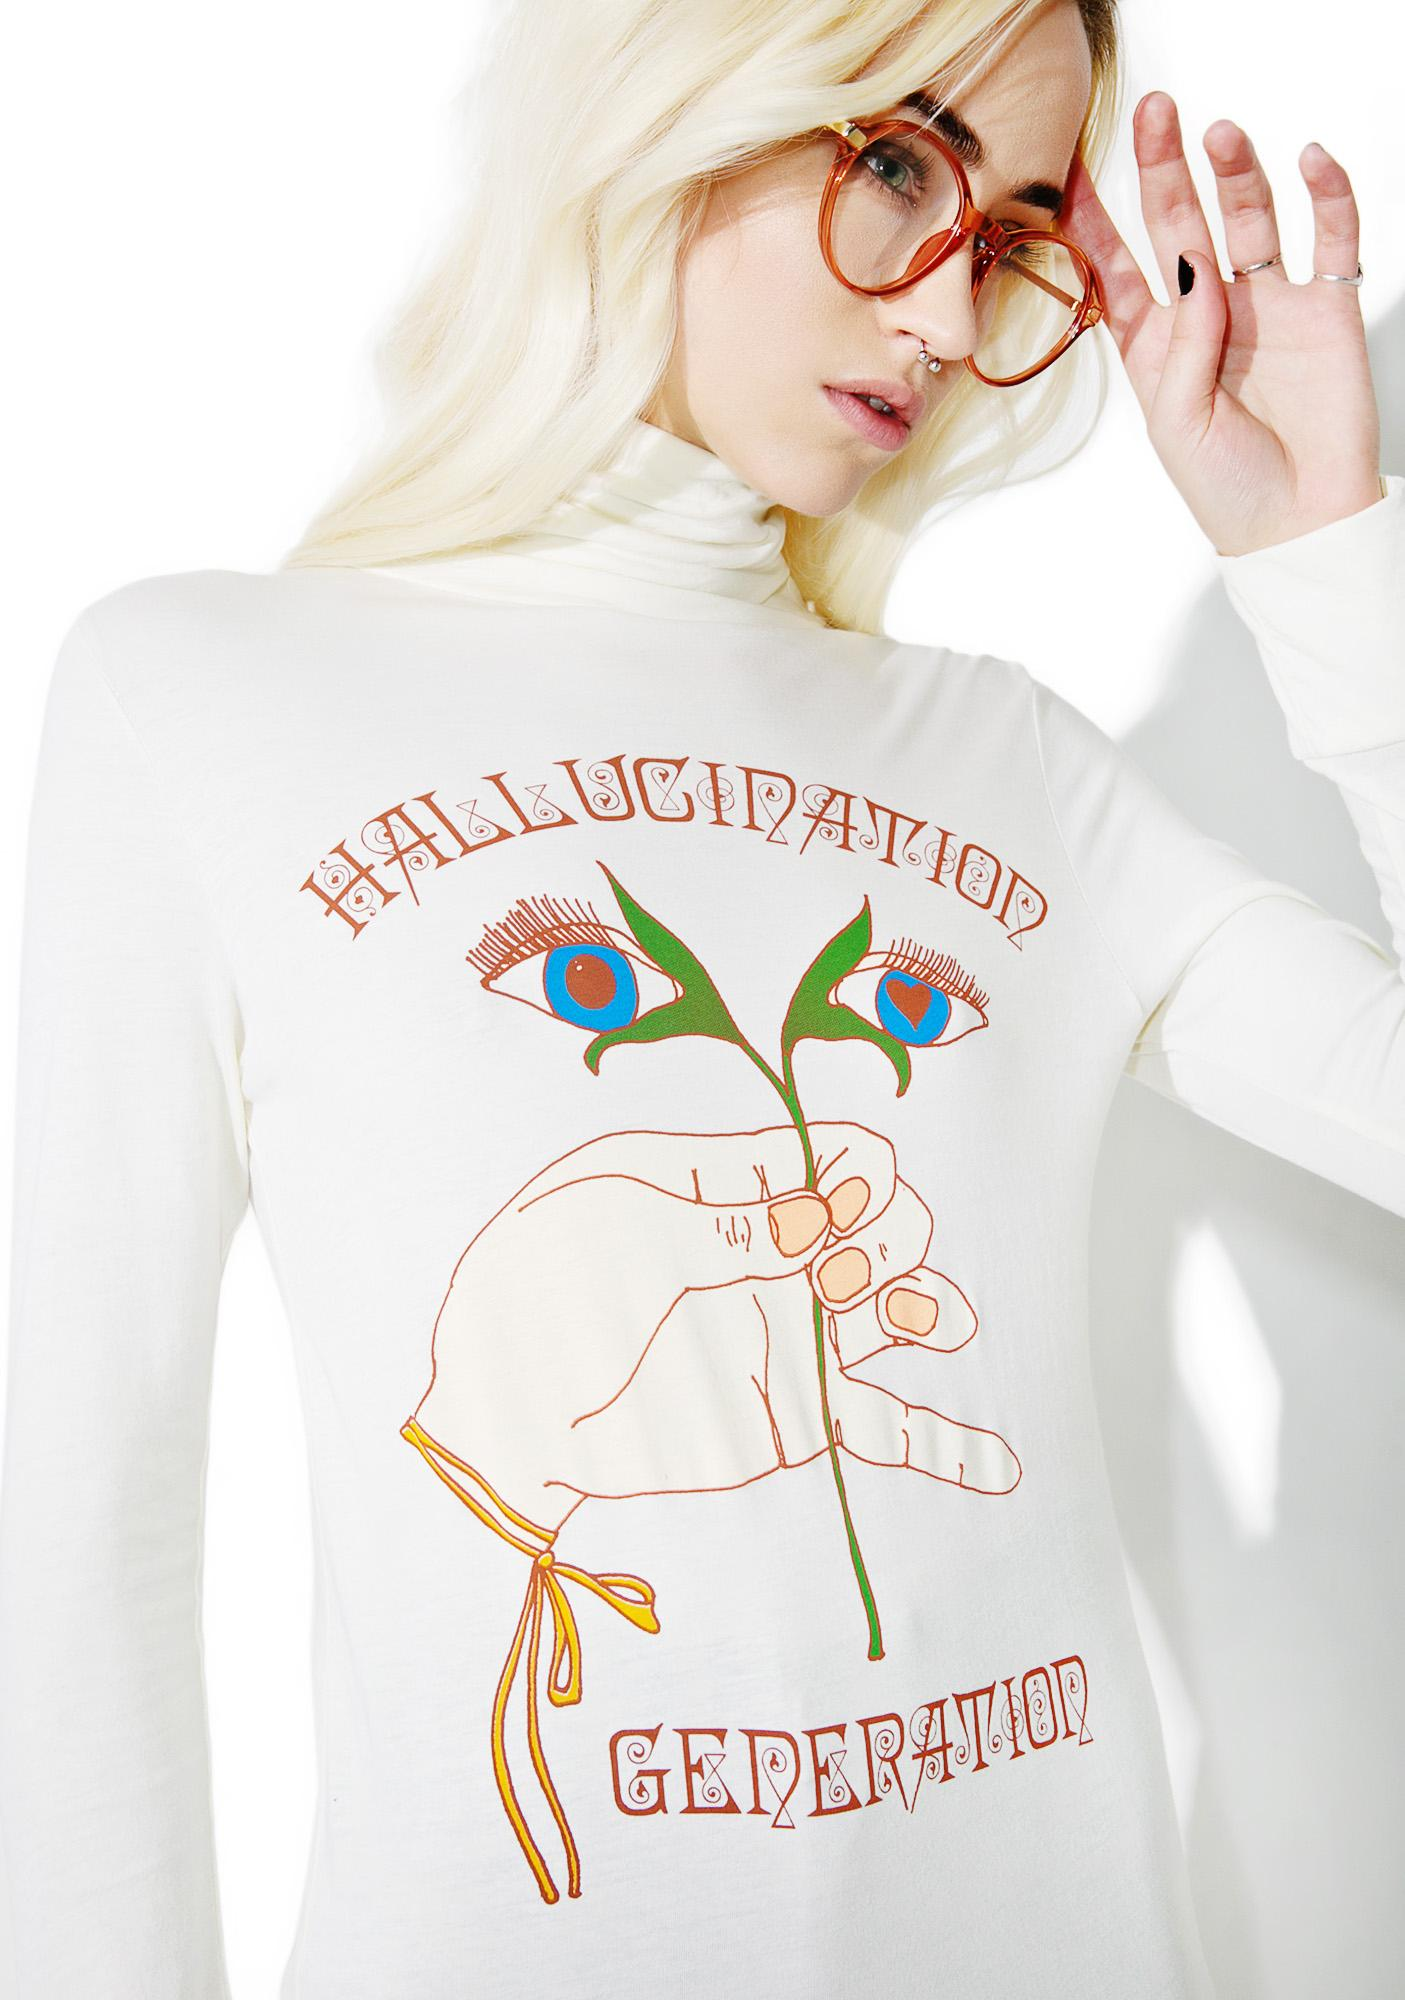 Sugarhigh + Lovestoned Hallucination Generation Turtleneck